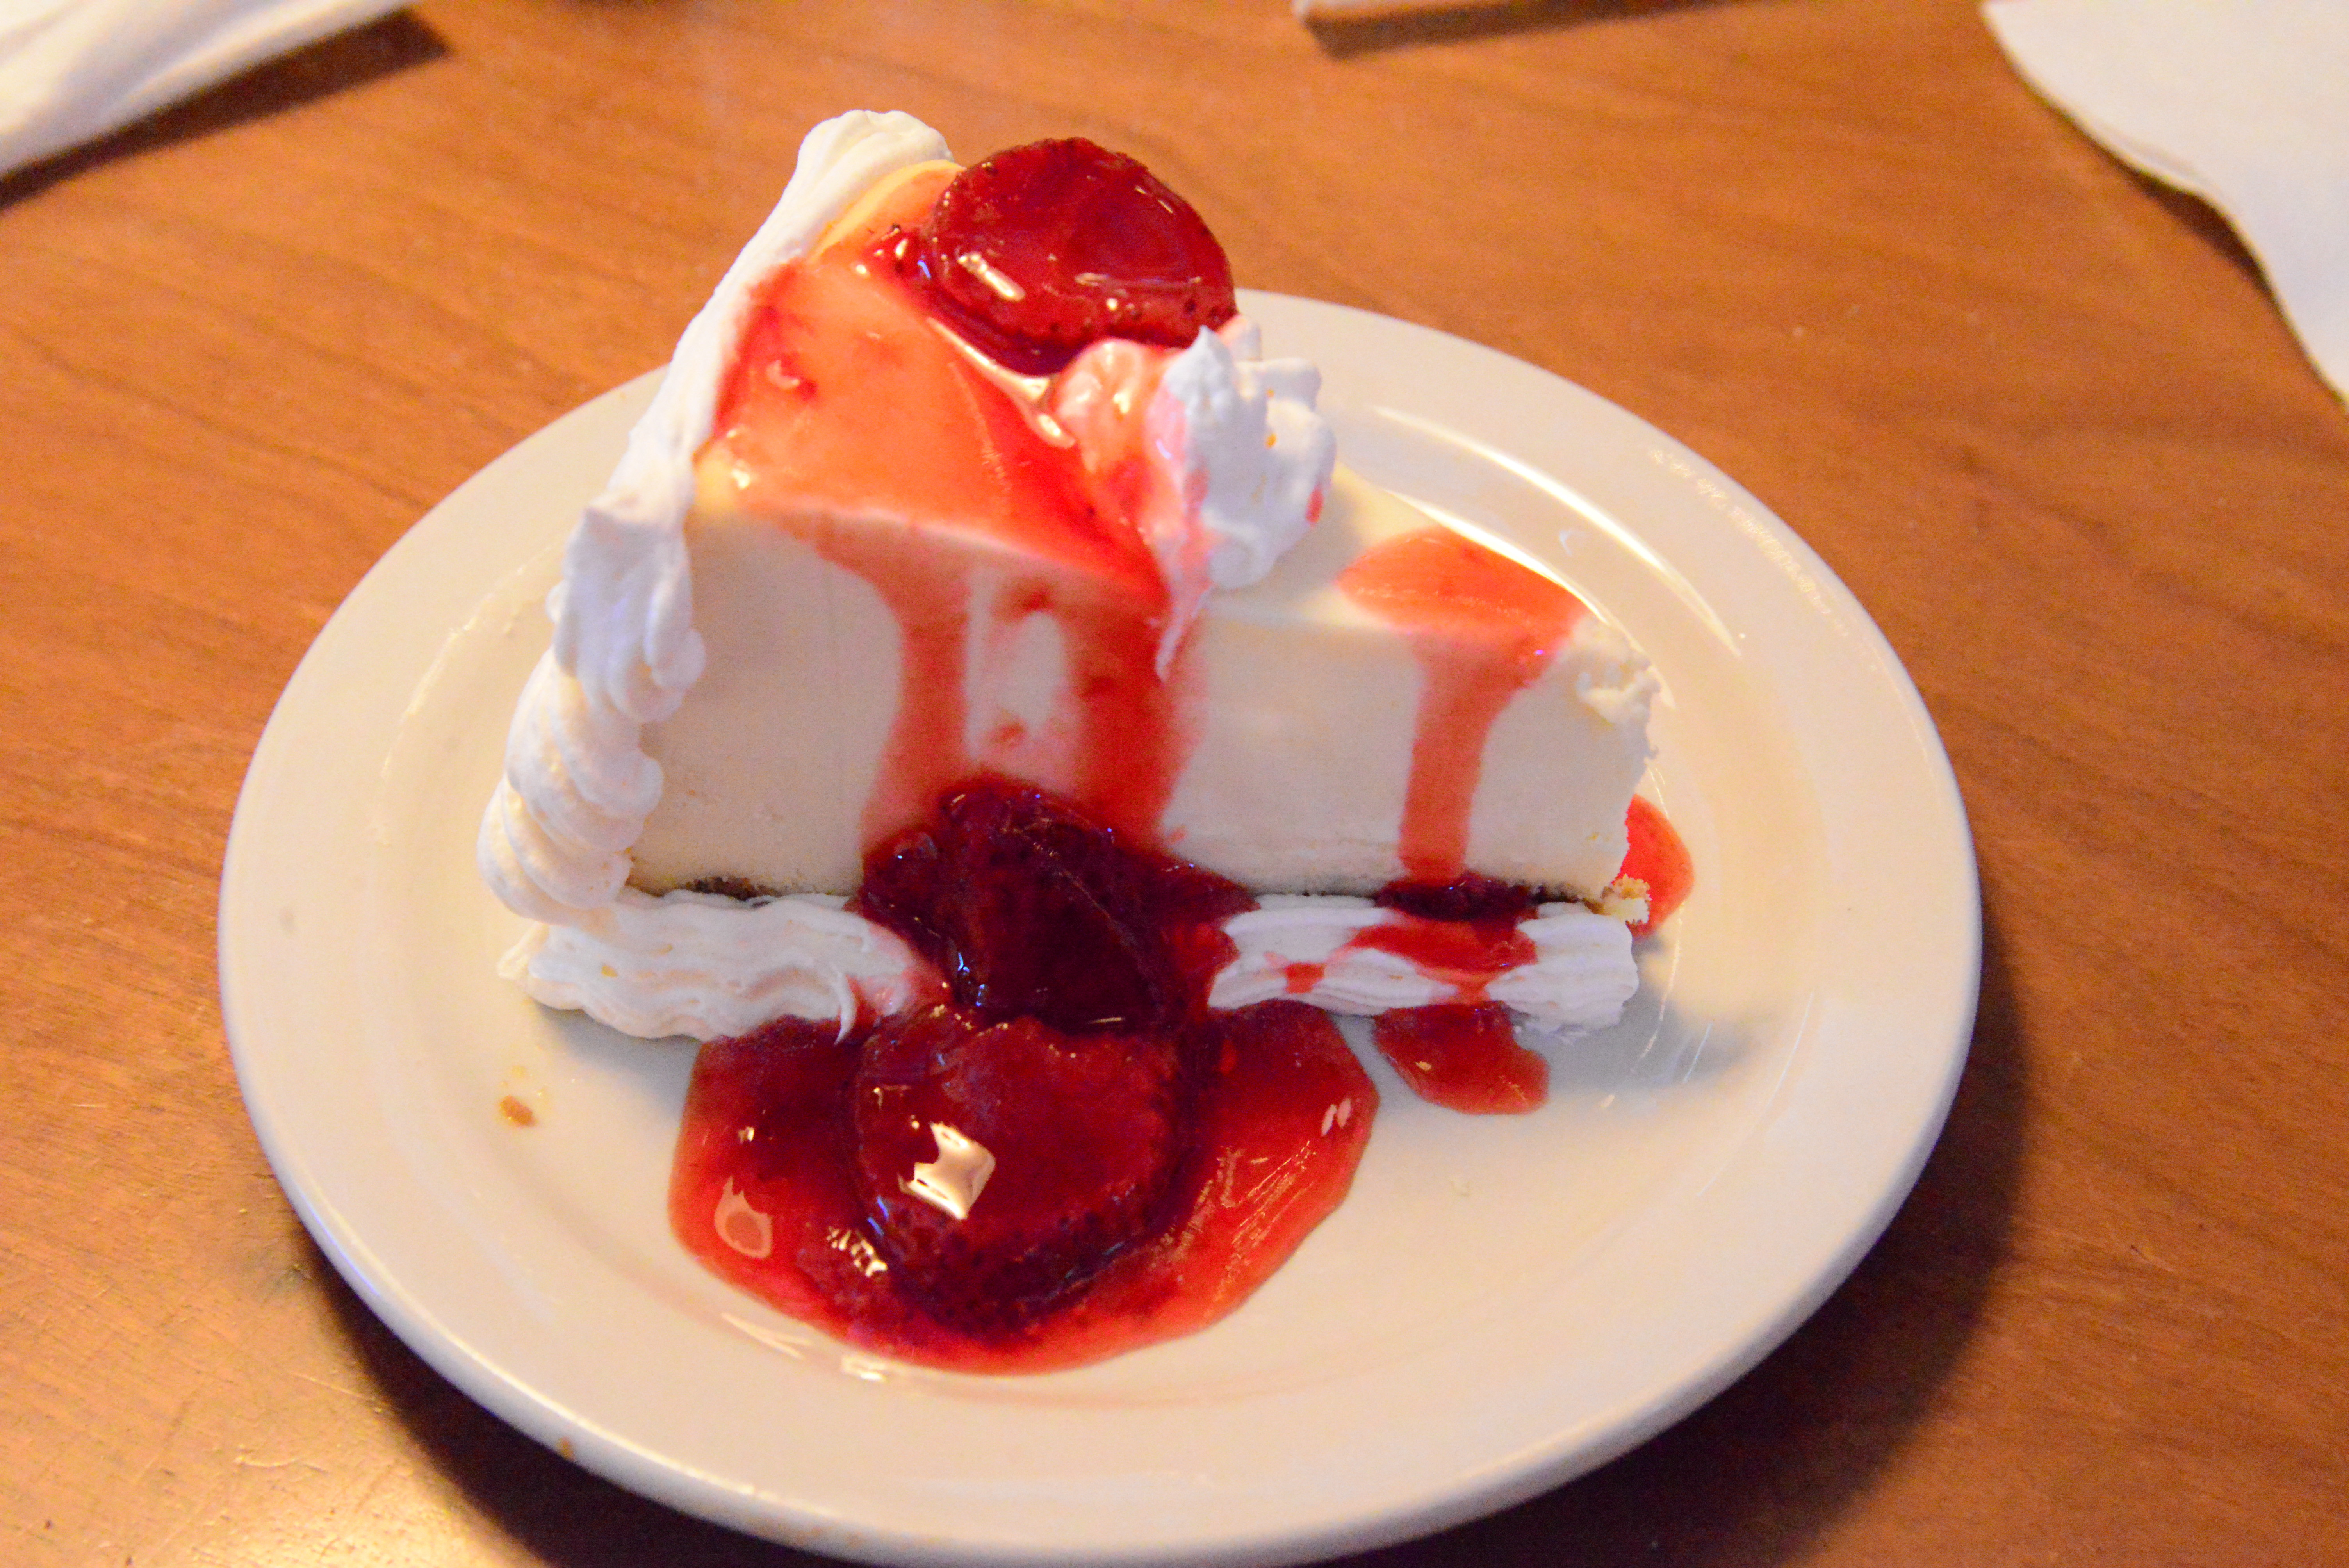 Texas Roadhouse Dessert Menu  Veteran's Free Lunch – Texas Roadhouse